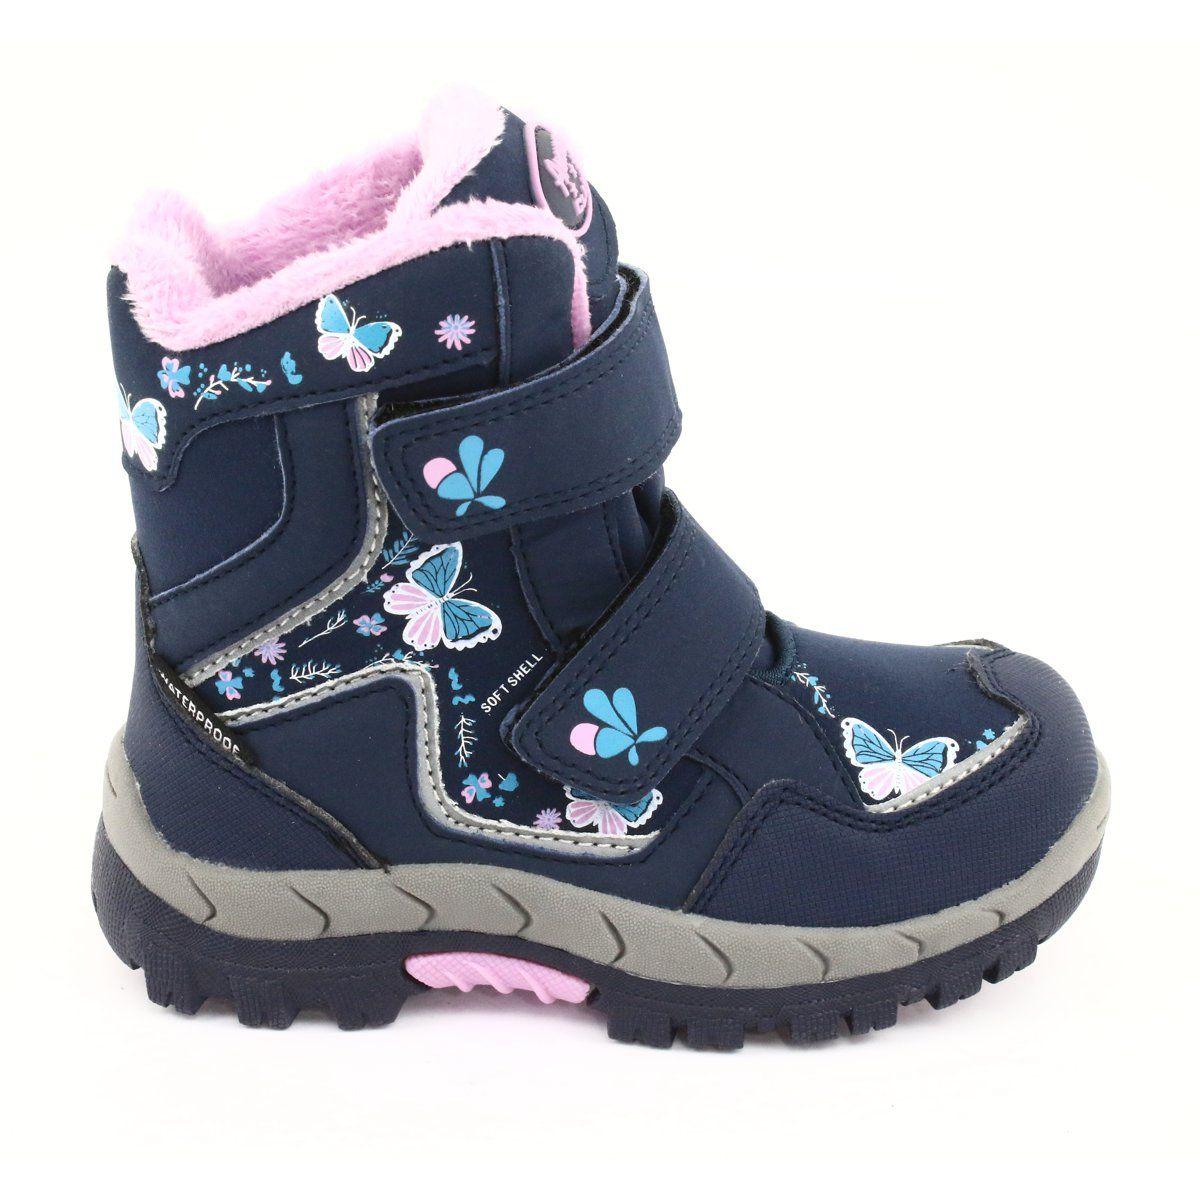 American Club Kozaki Z Membrana Hl28 Motyle Granatowe Niebieskie Rozowe Boots Childrens Boots Kid Shoes